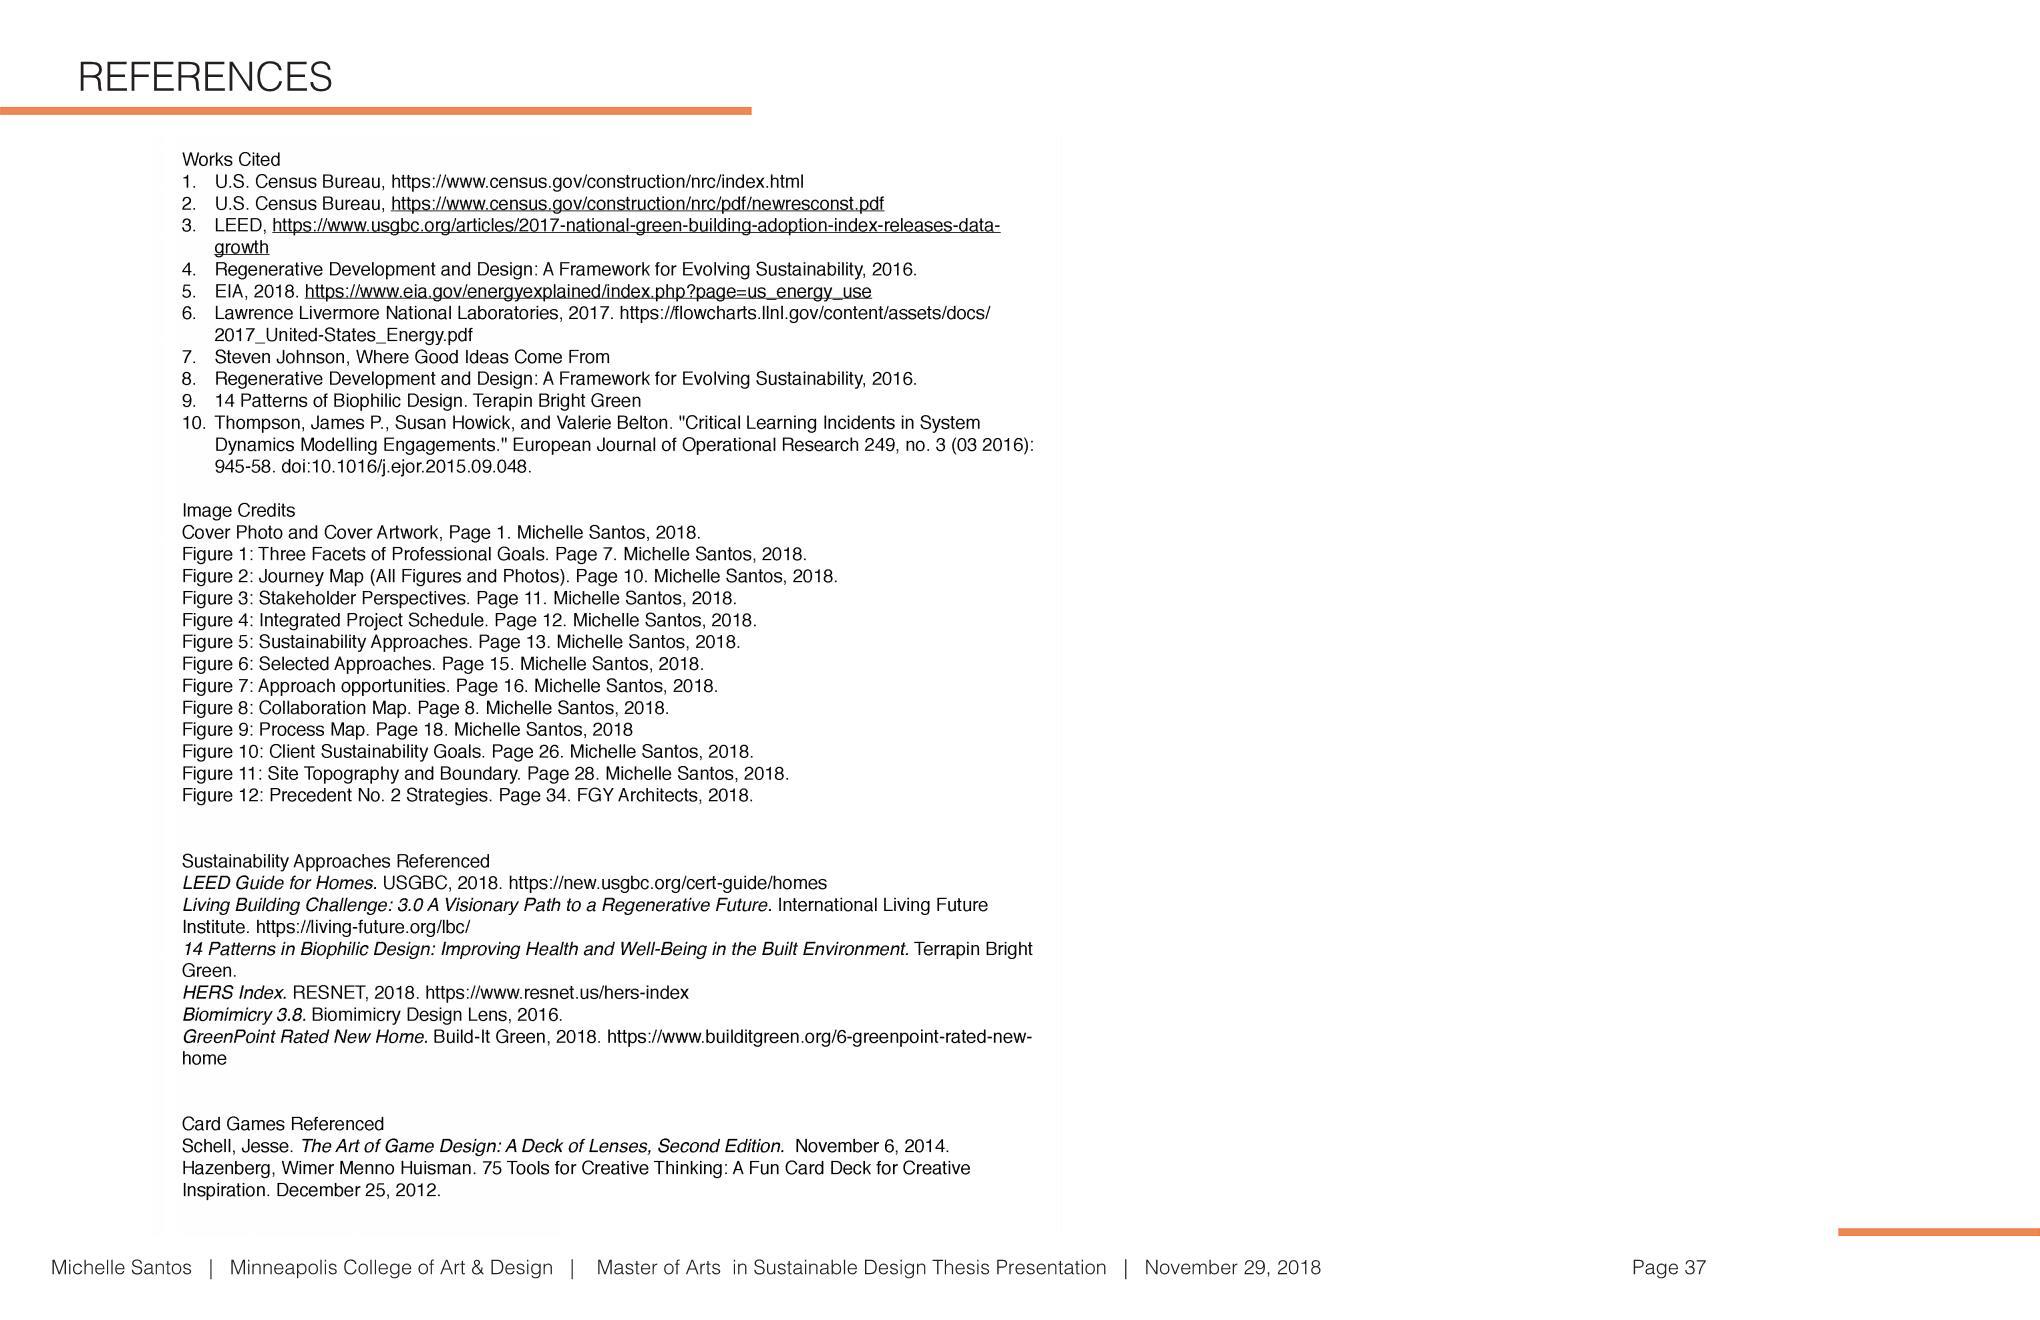 MSantos_Thesis Presentation_2018.12.11_small2 Page 042.jpg